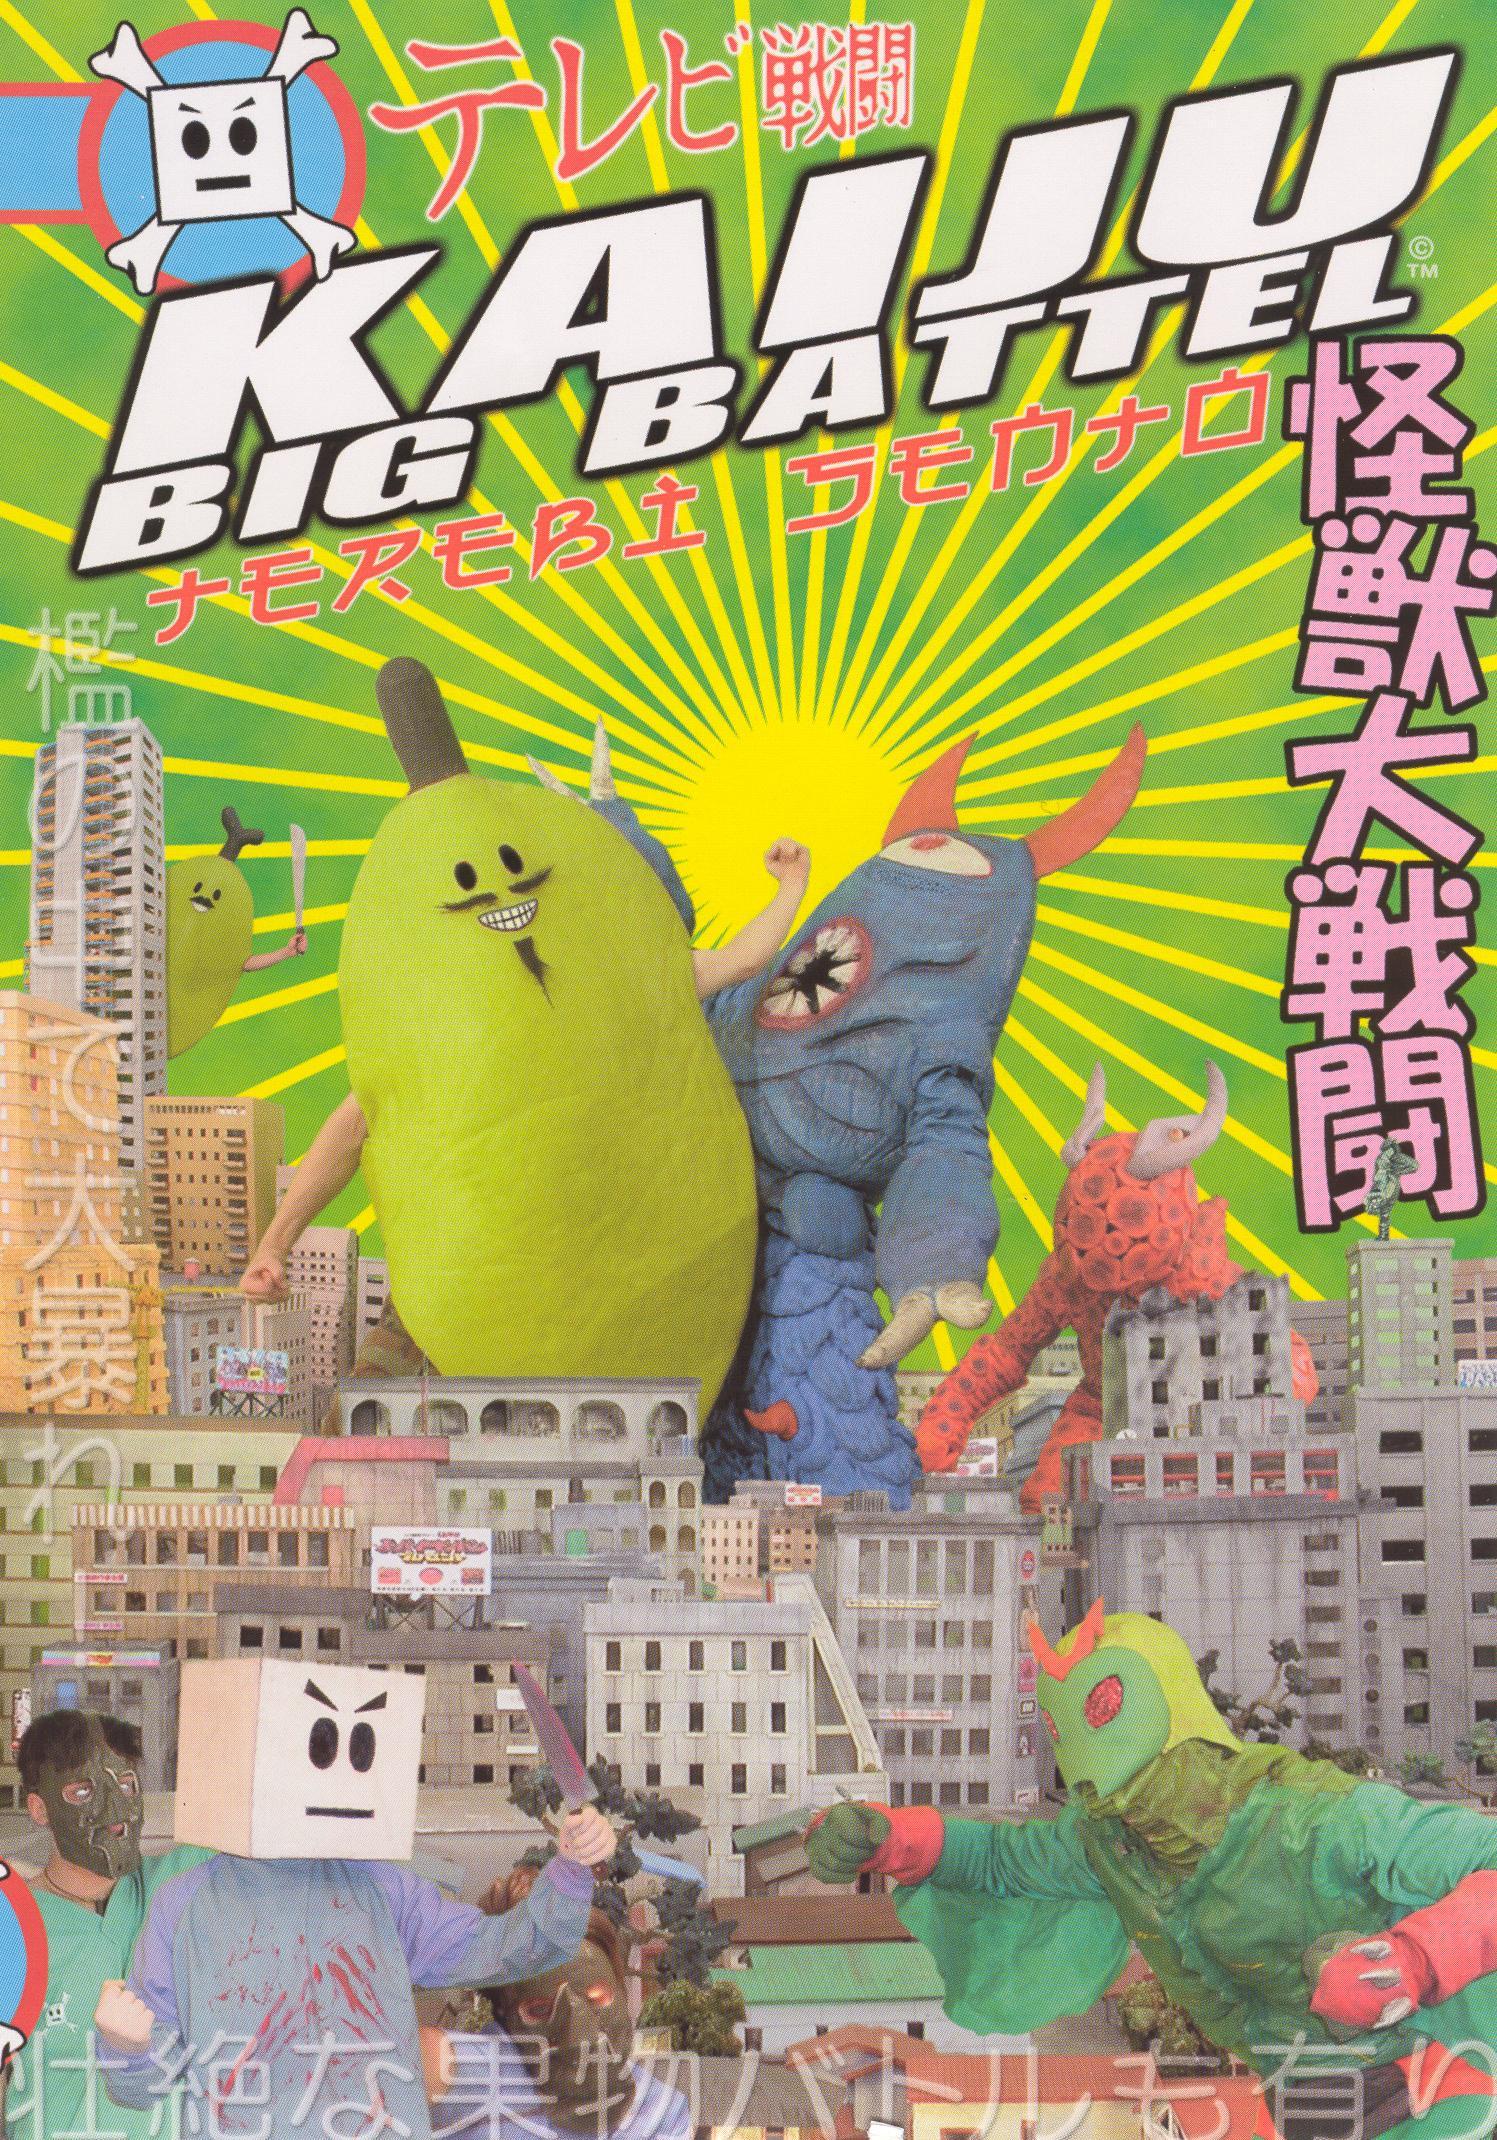 Kaiju Big Battel: Terebi Sento